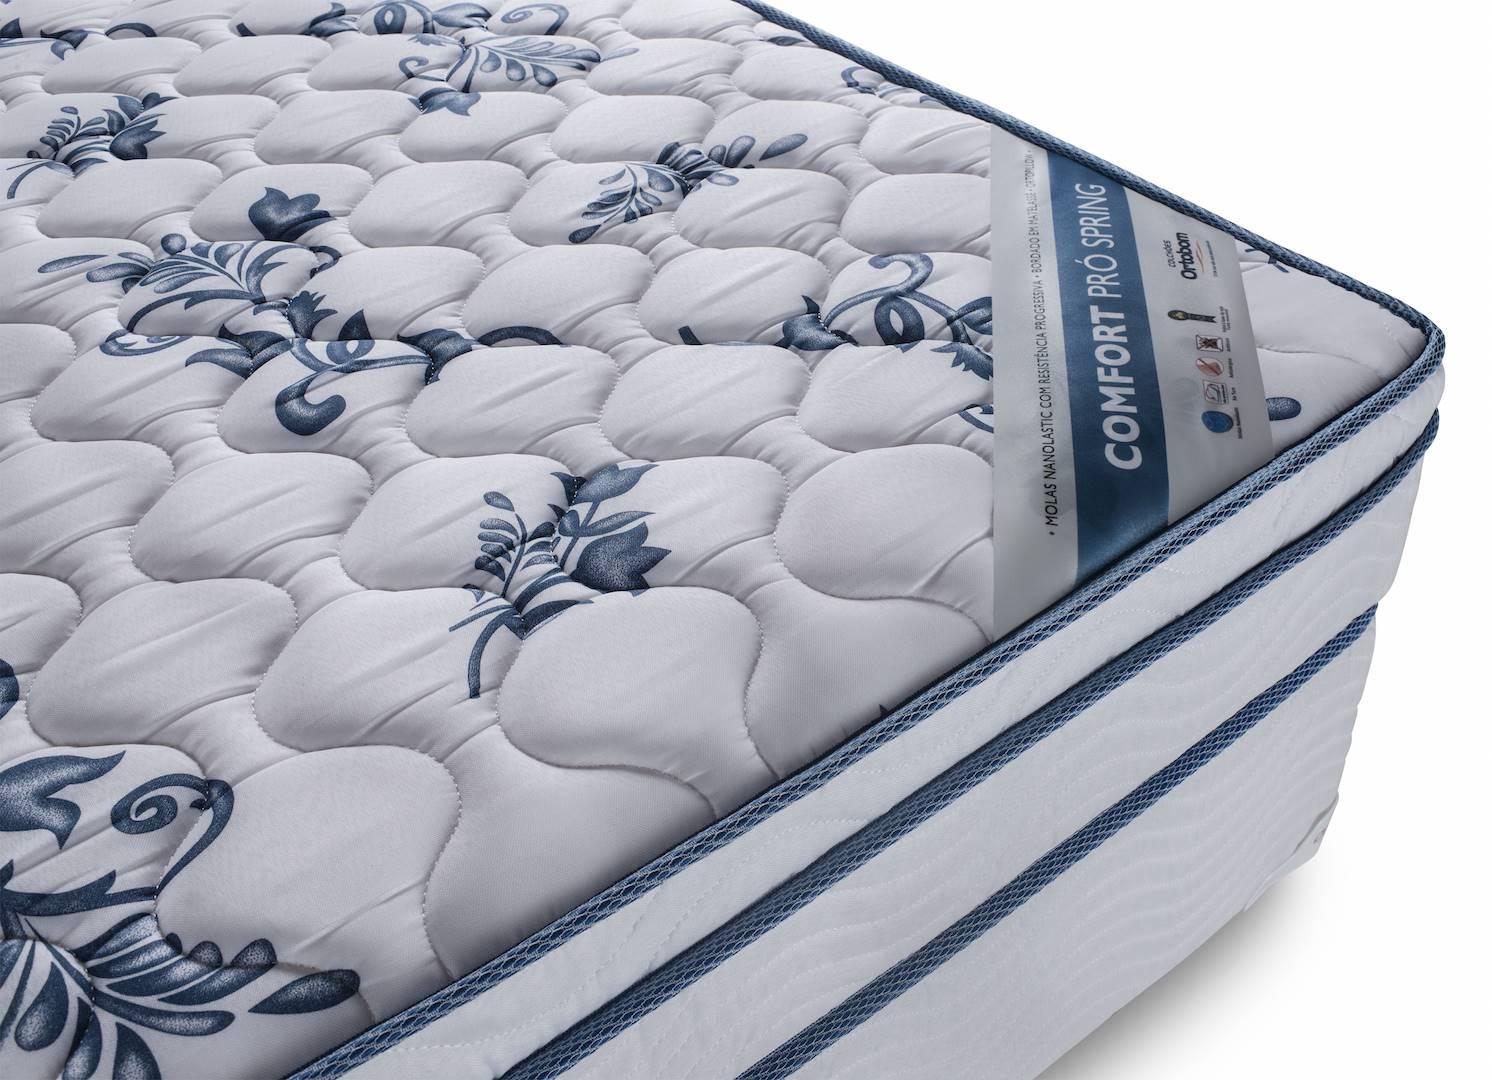 Colchao Comfort Pro Spring Casal 138 cm (LARG) Branco e Azul - 43015